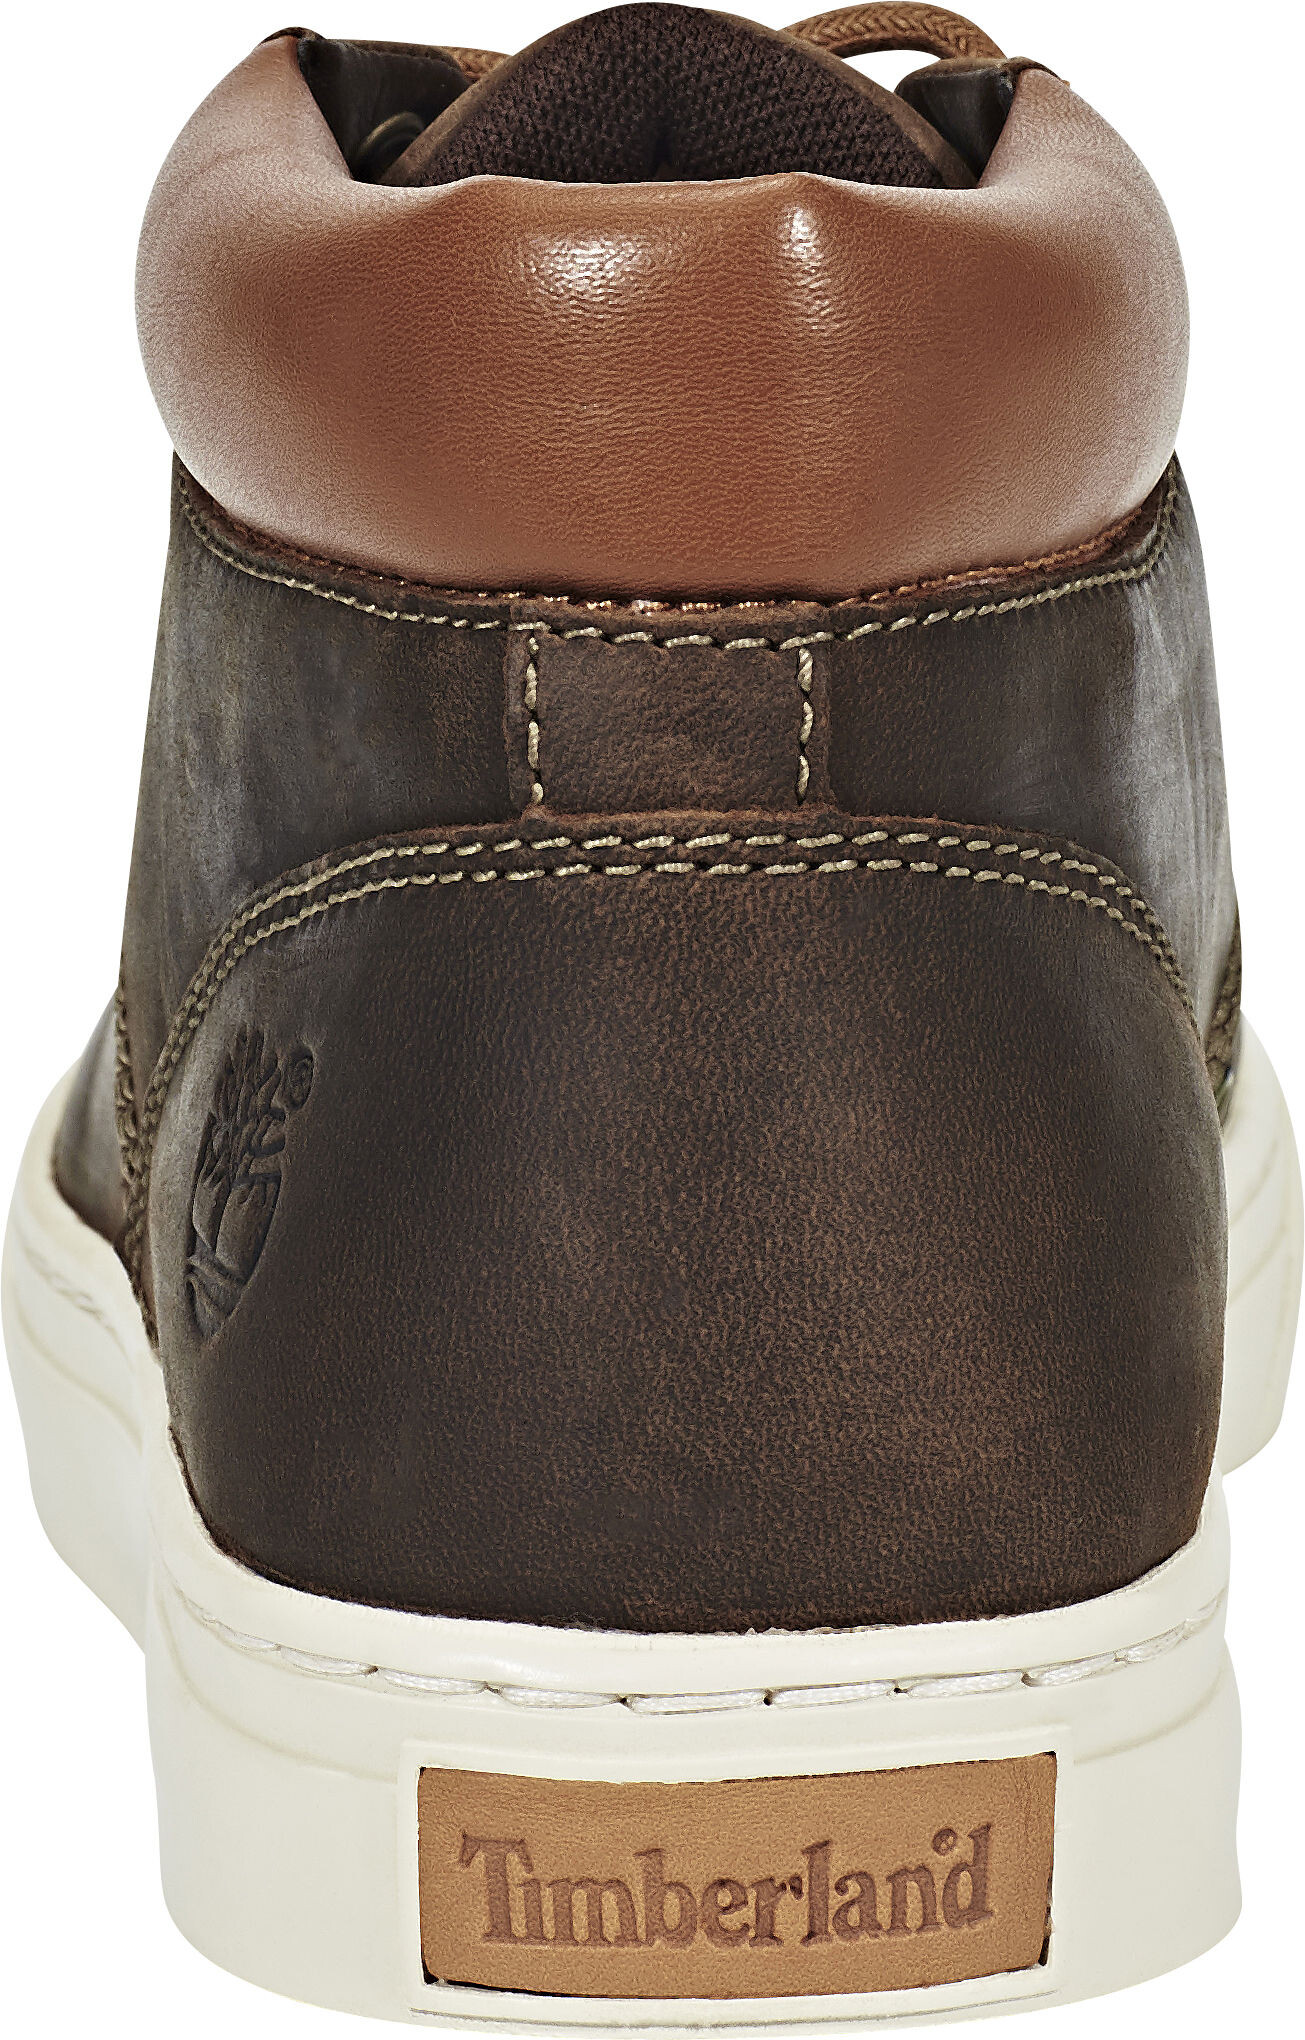 8c342150d9cc9 Timberland Adventure 2.0 Cupsole Chukka Shoes Men dark olive roughcut